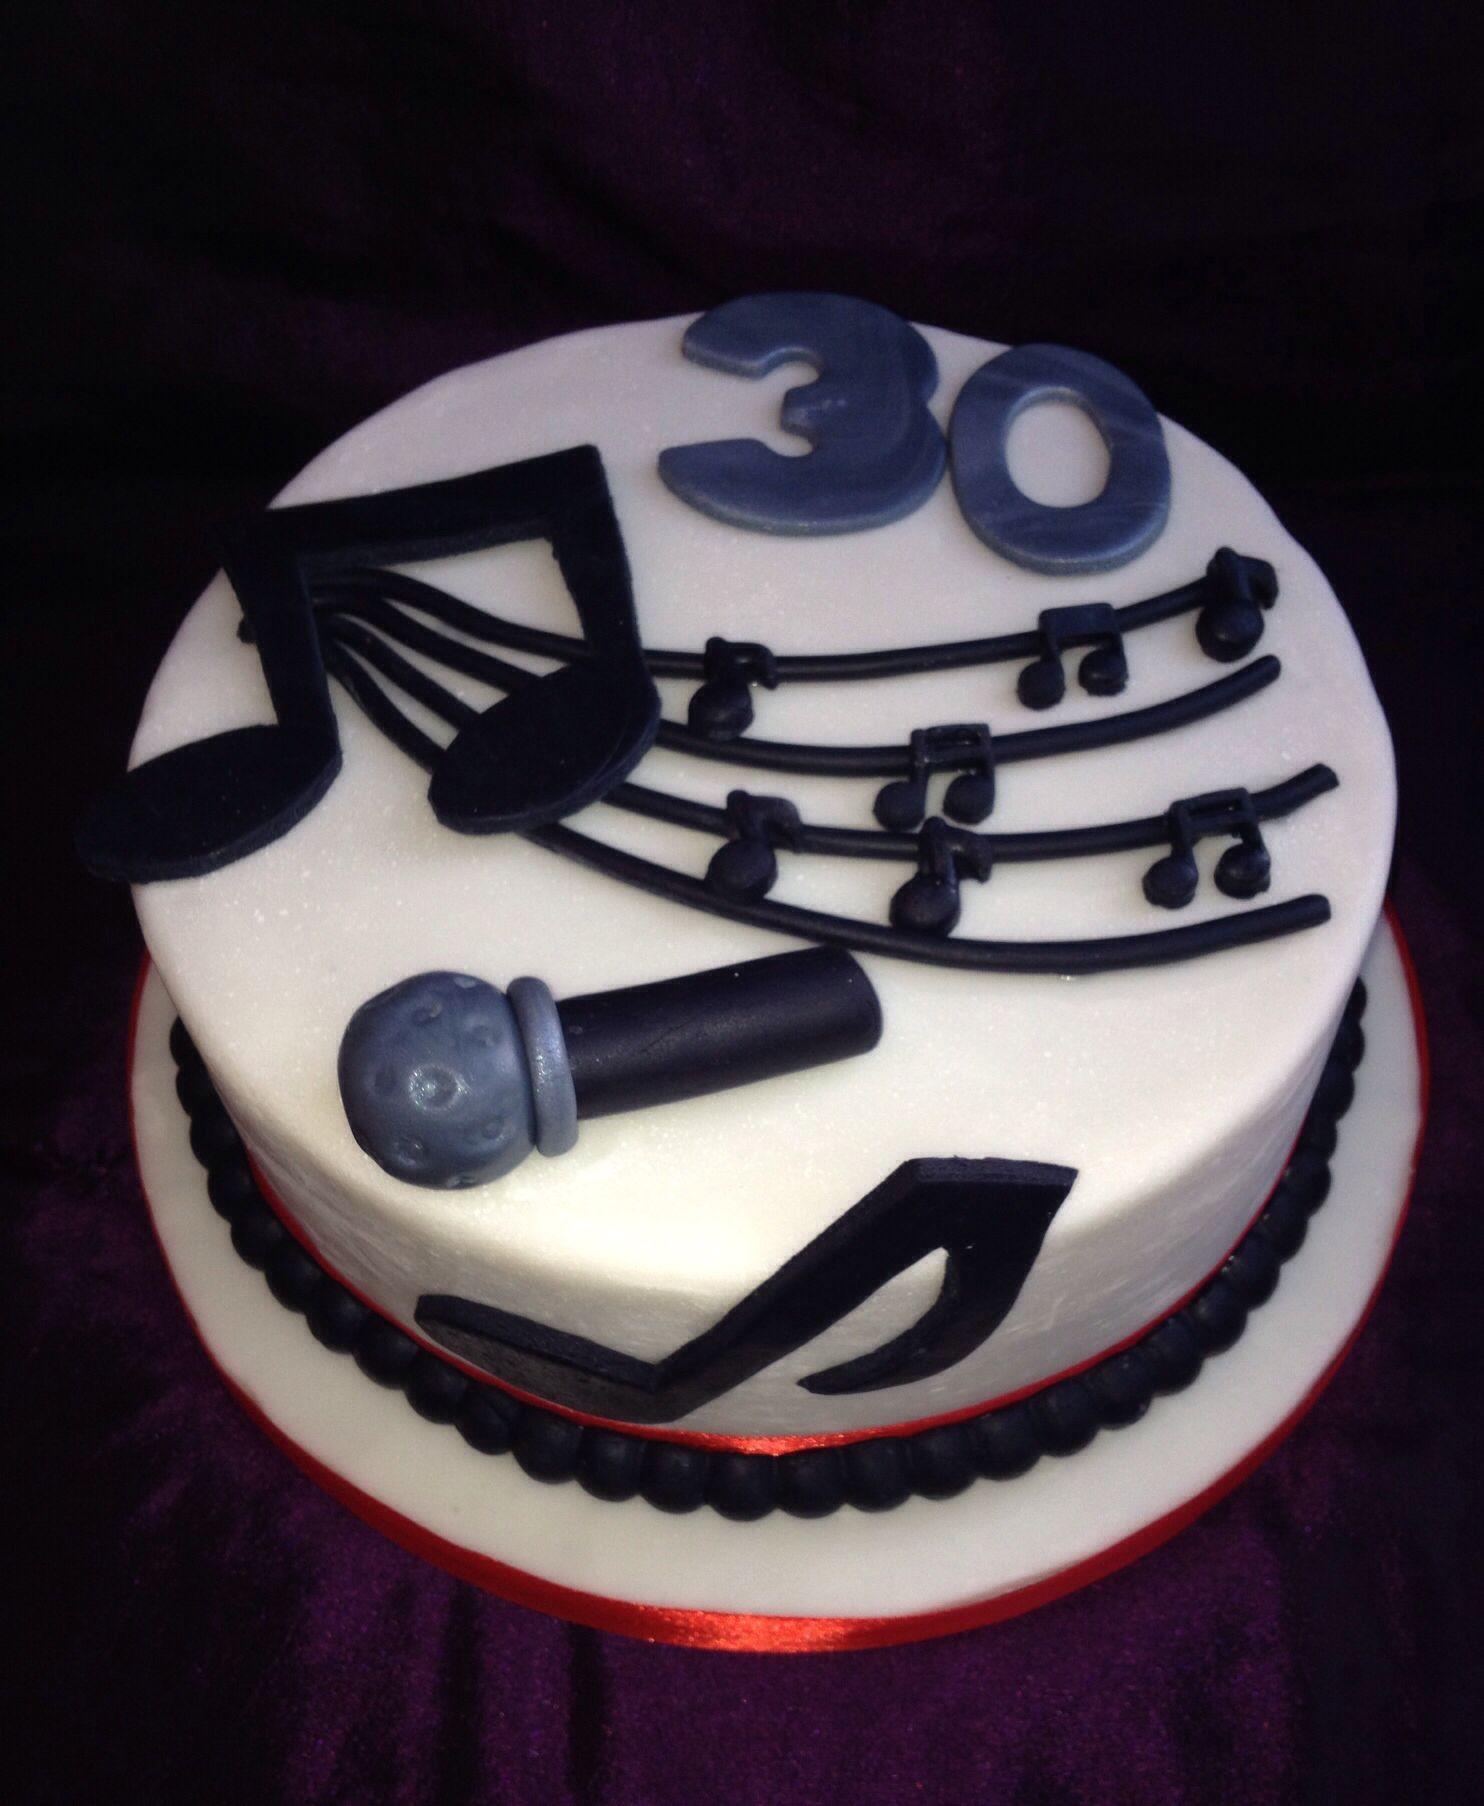 Musical Cake Microphone Cake